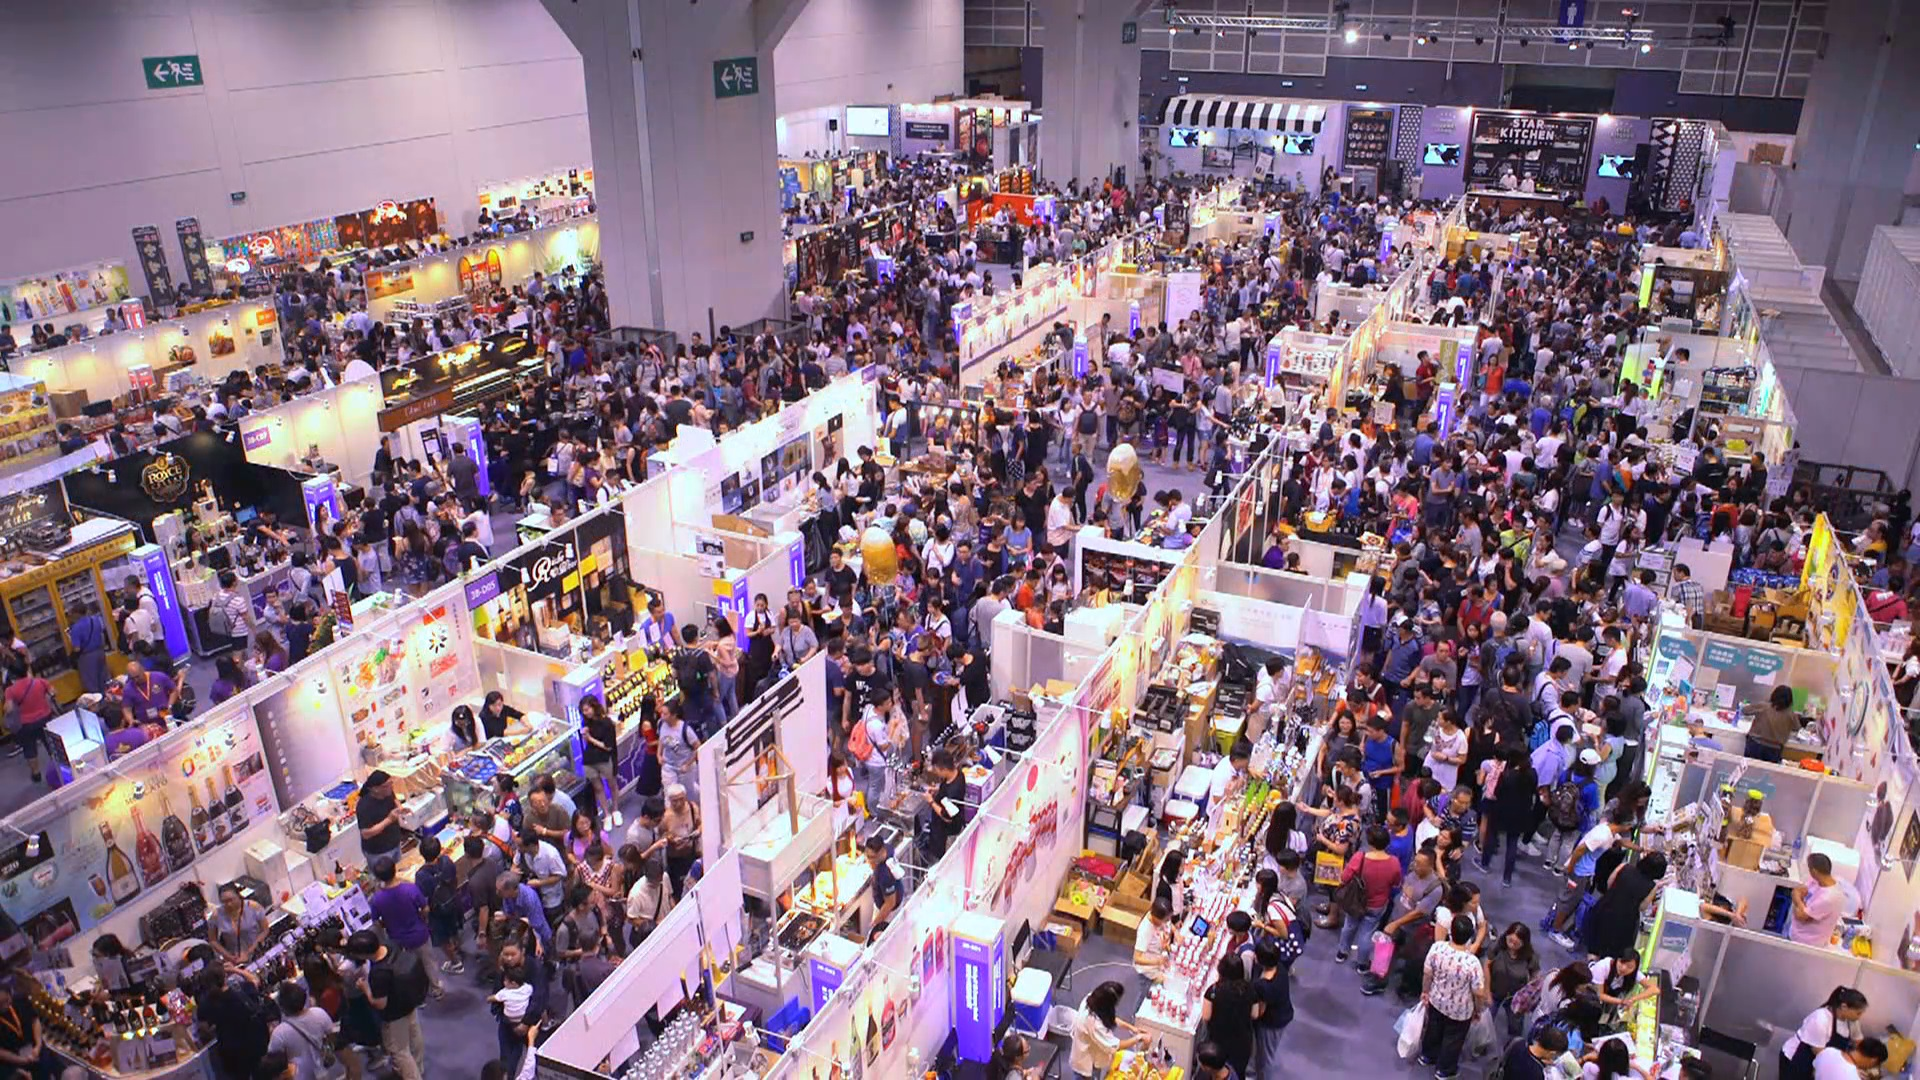 Hktdccom Food Expo 17 Fair Highlights